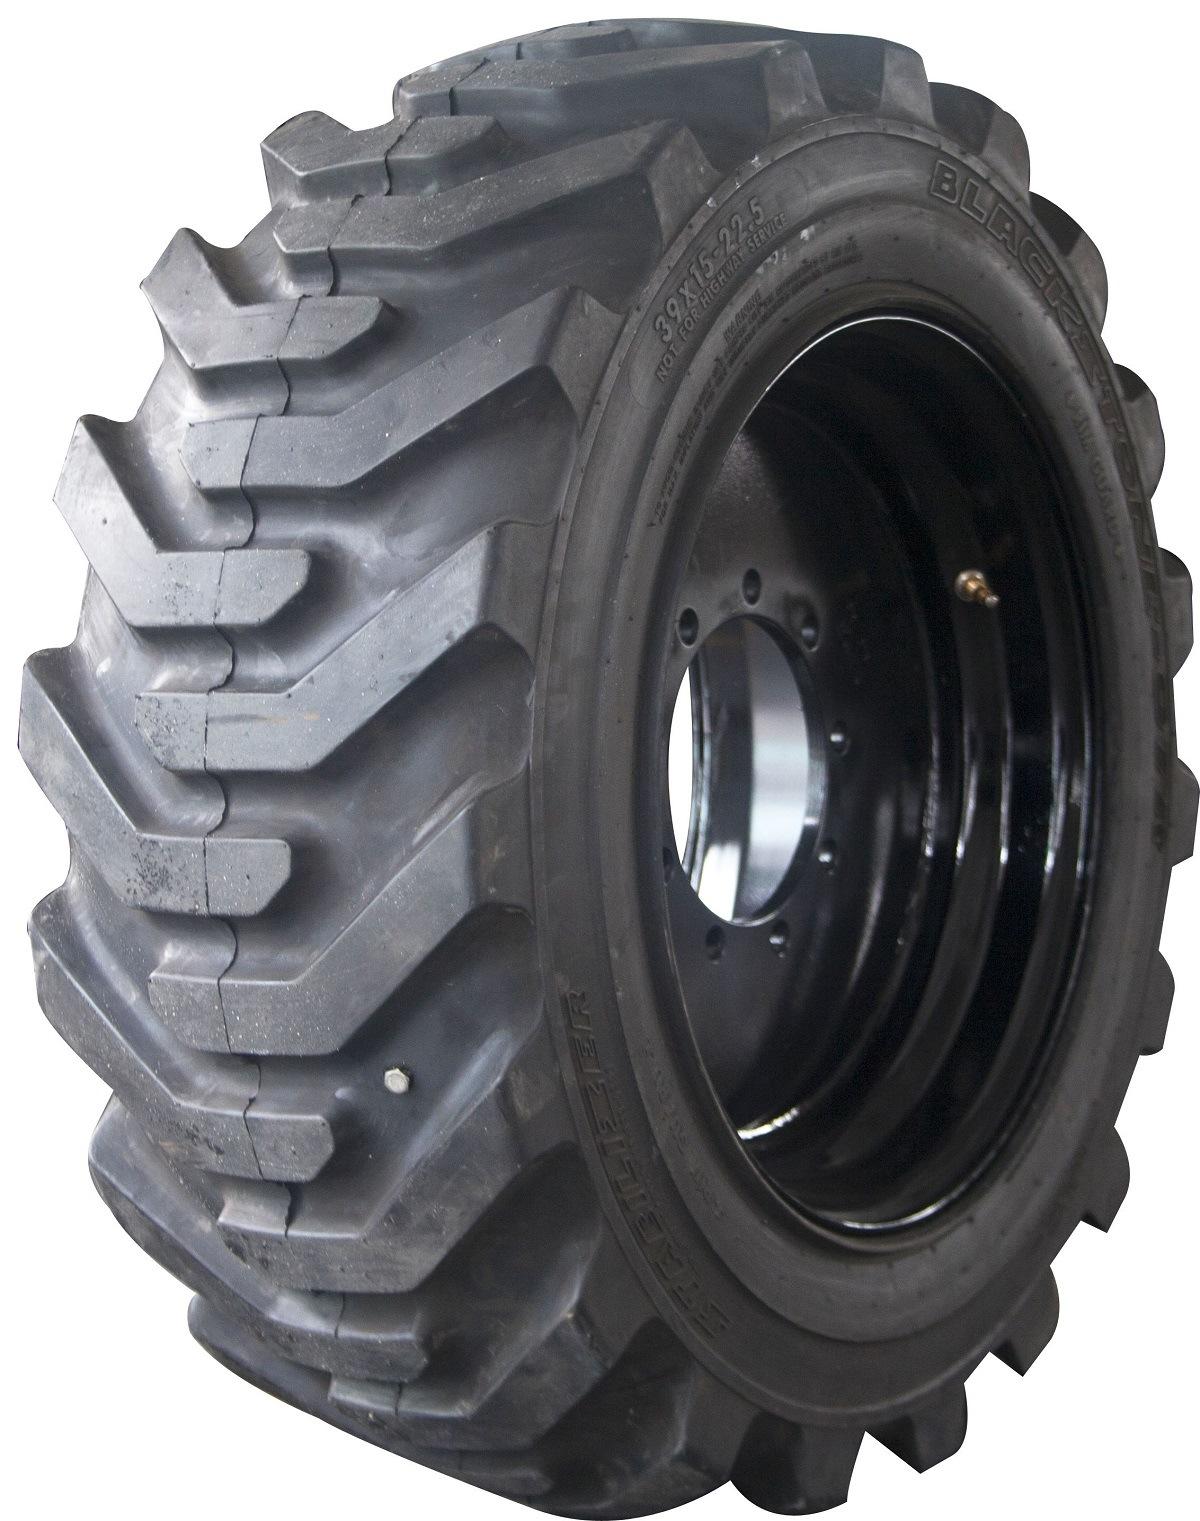 Loader Truck Tire Radial OTR Tire E3/L3 Pattern 25.5r25